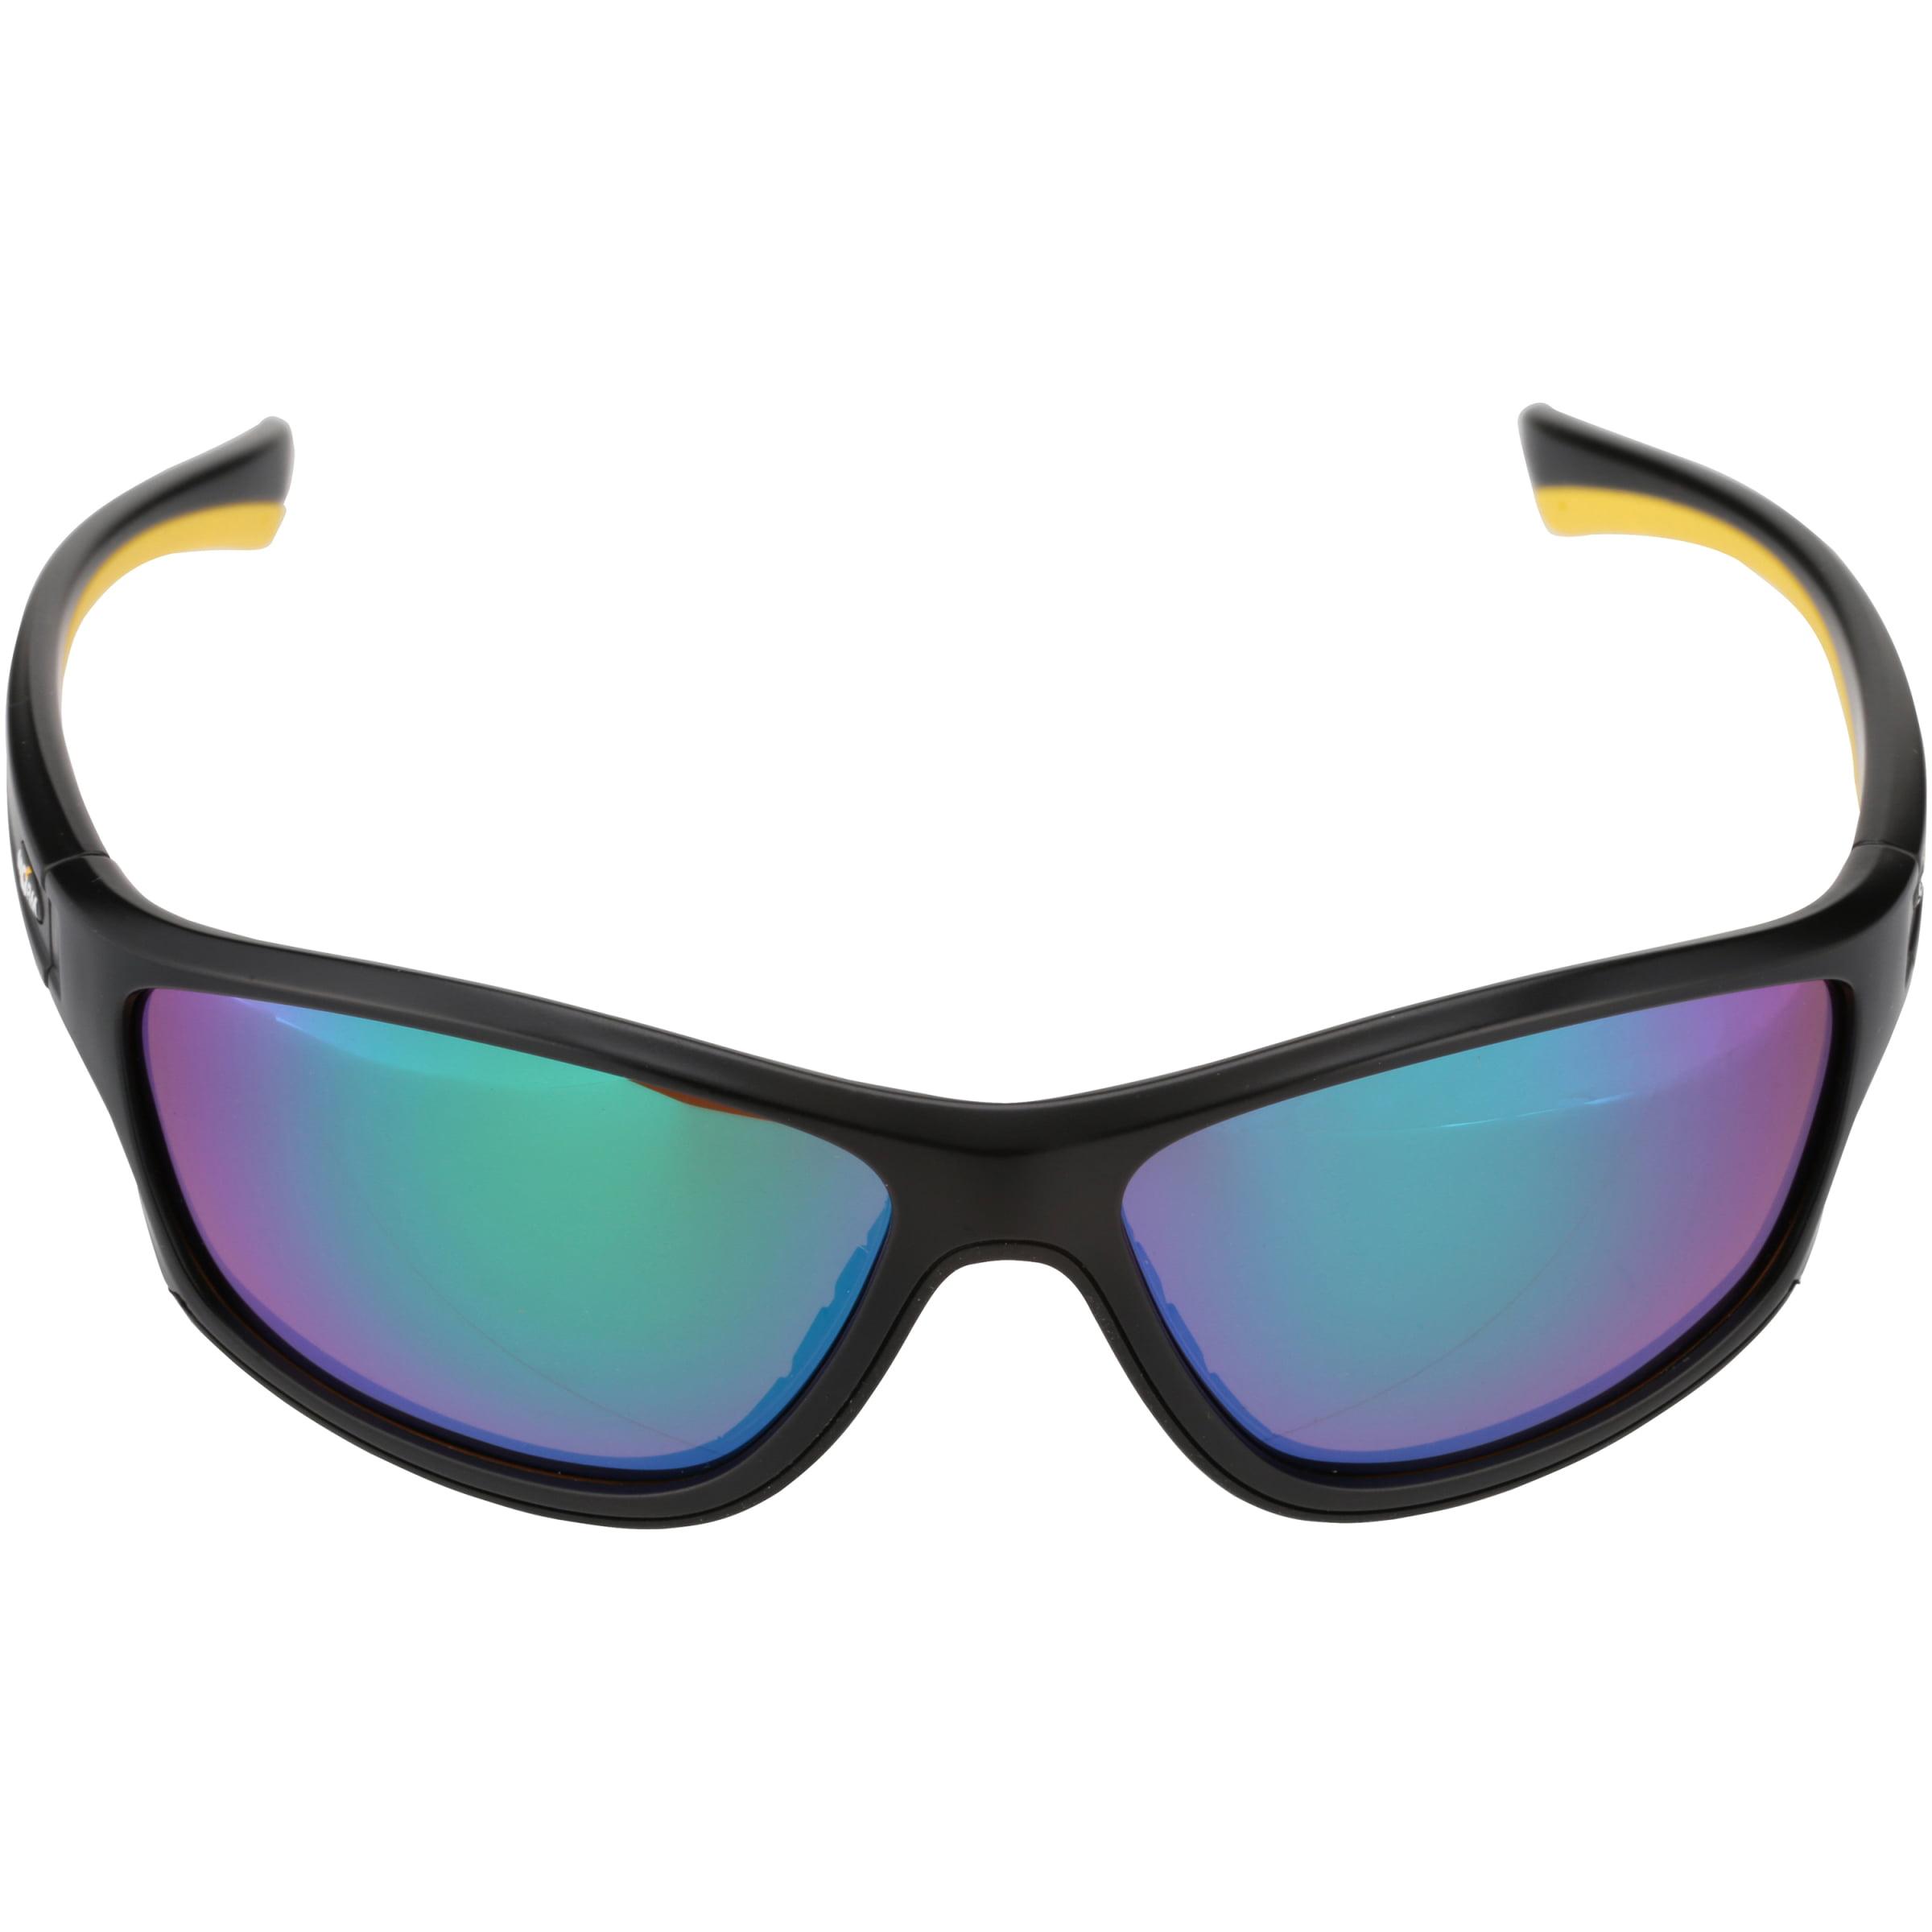 Storm High Performance Fishing Glasses 1 pr Clamshell